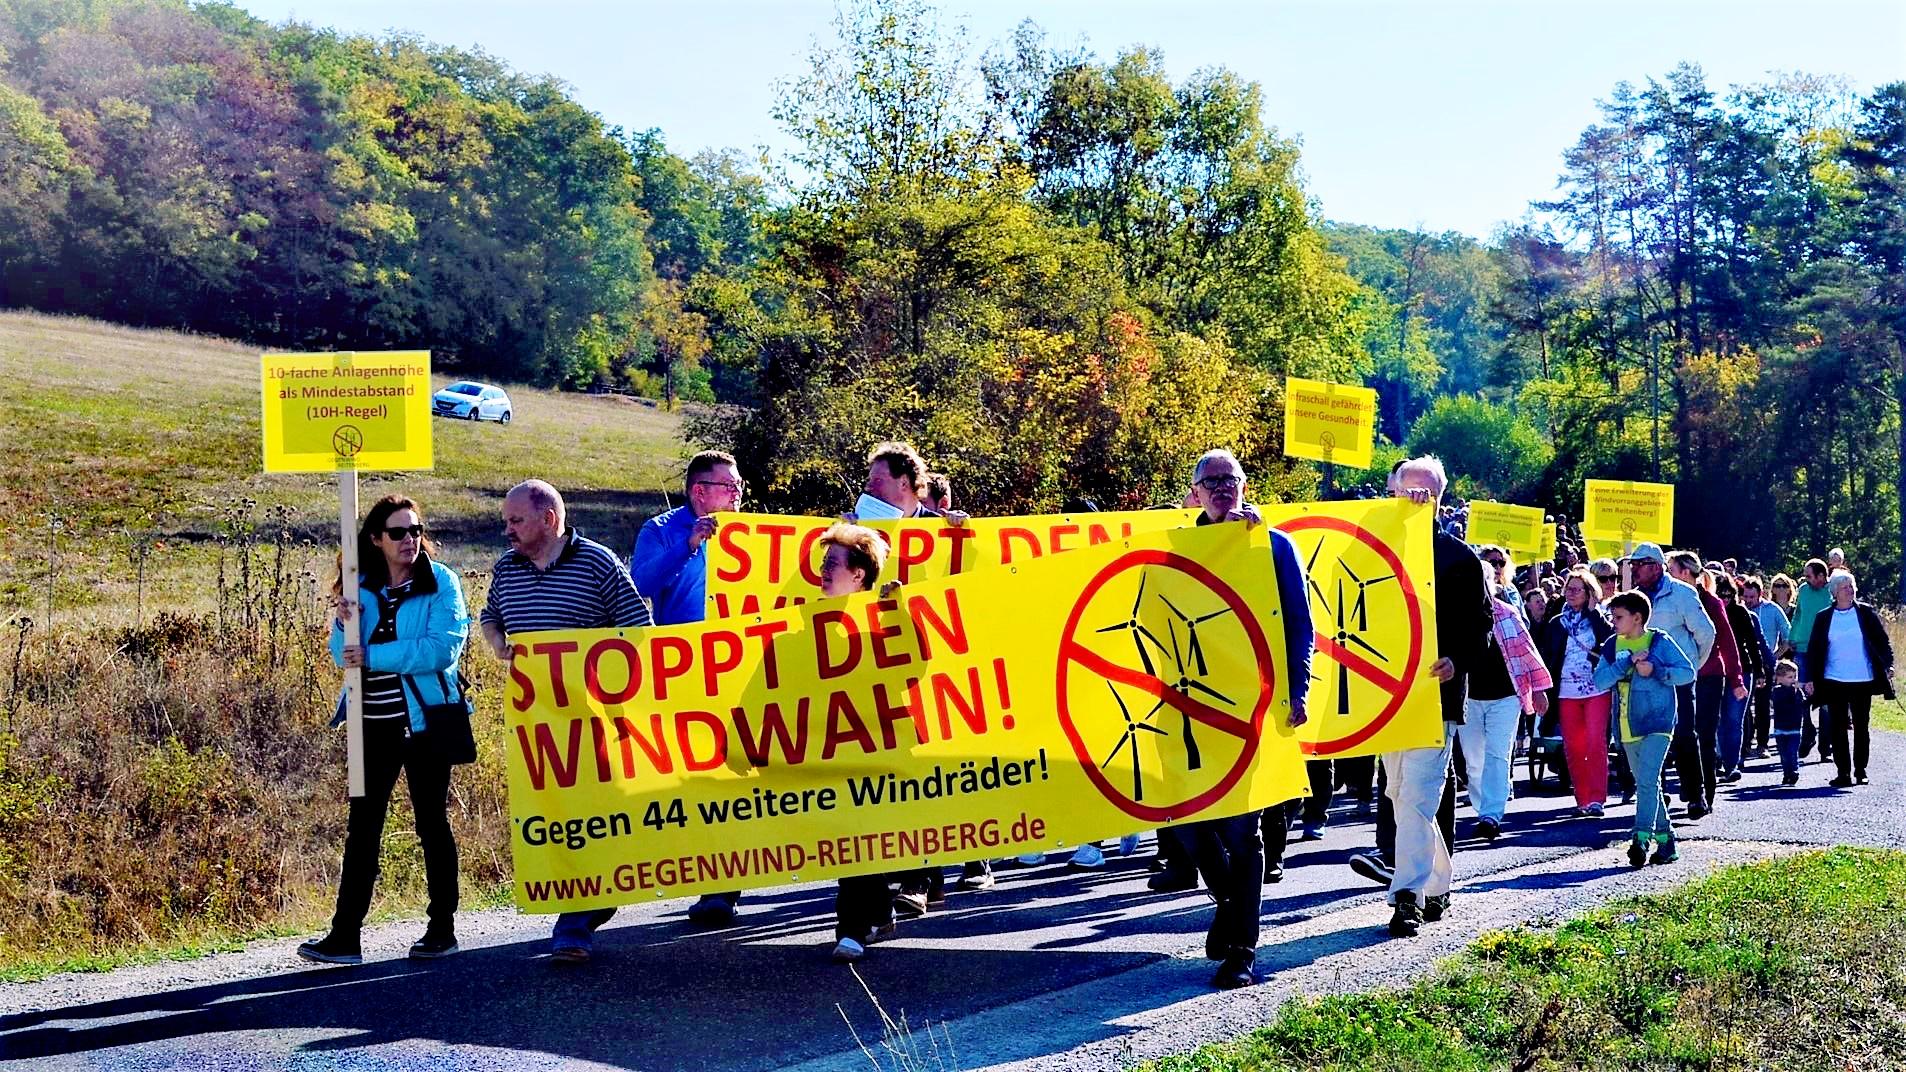 Gegendwind-Demo auf dem Harsberg bei Lauterbach